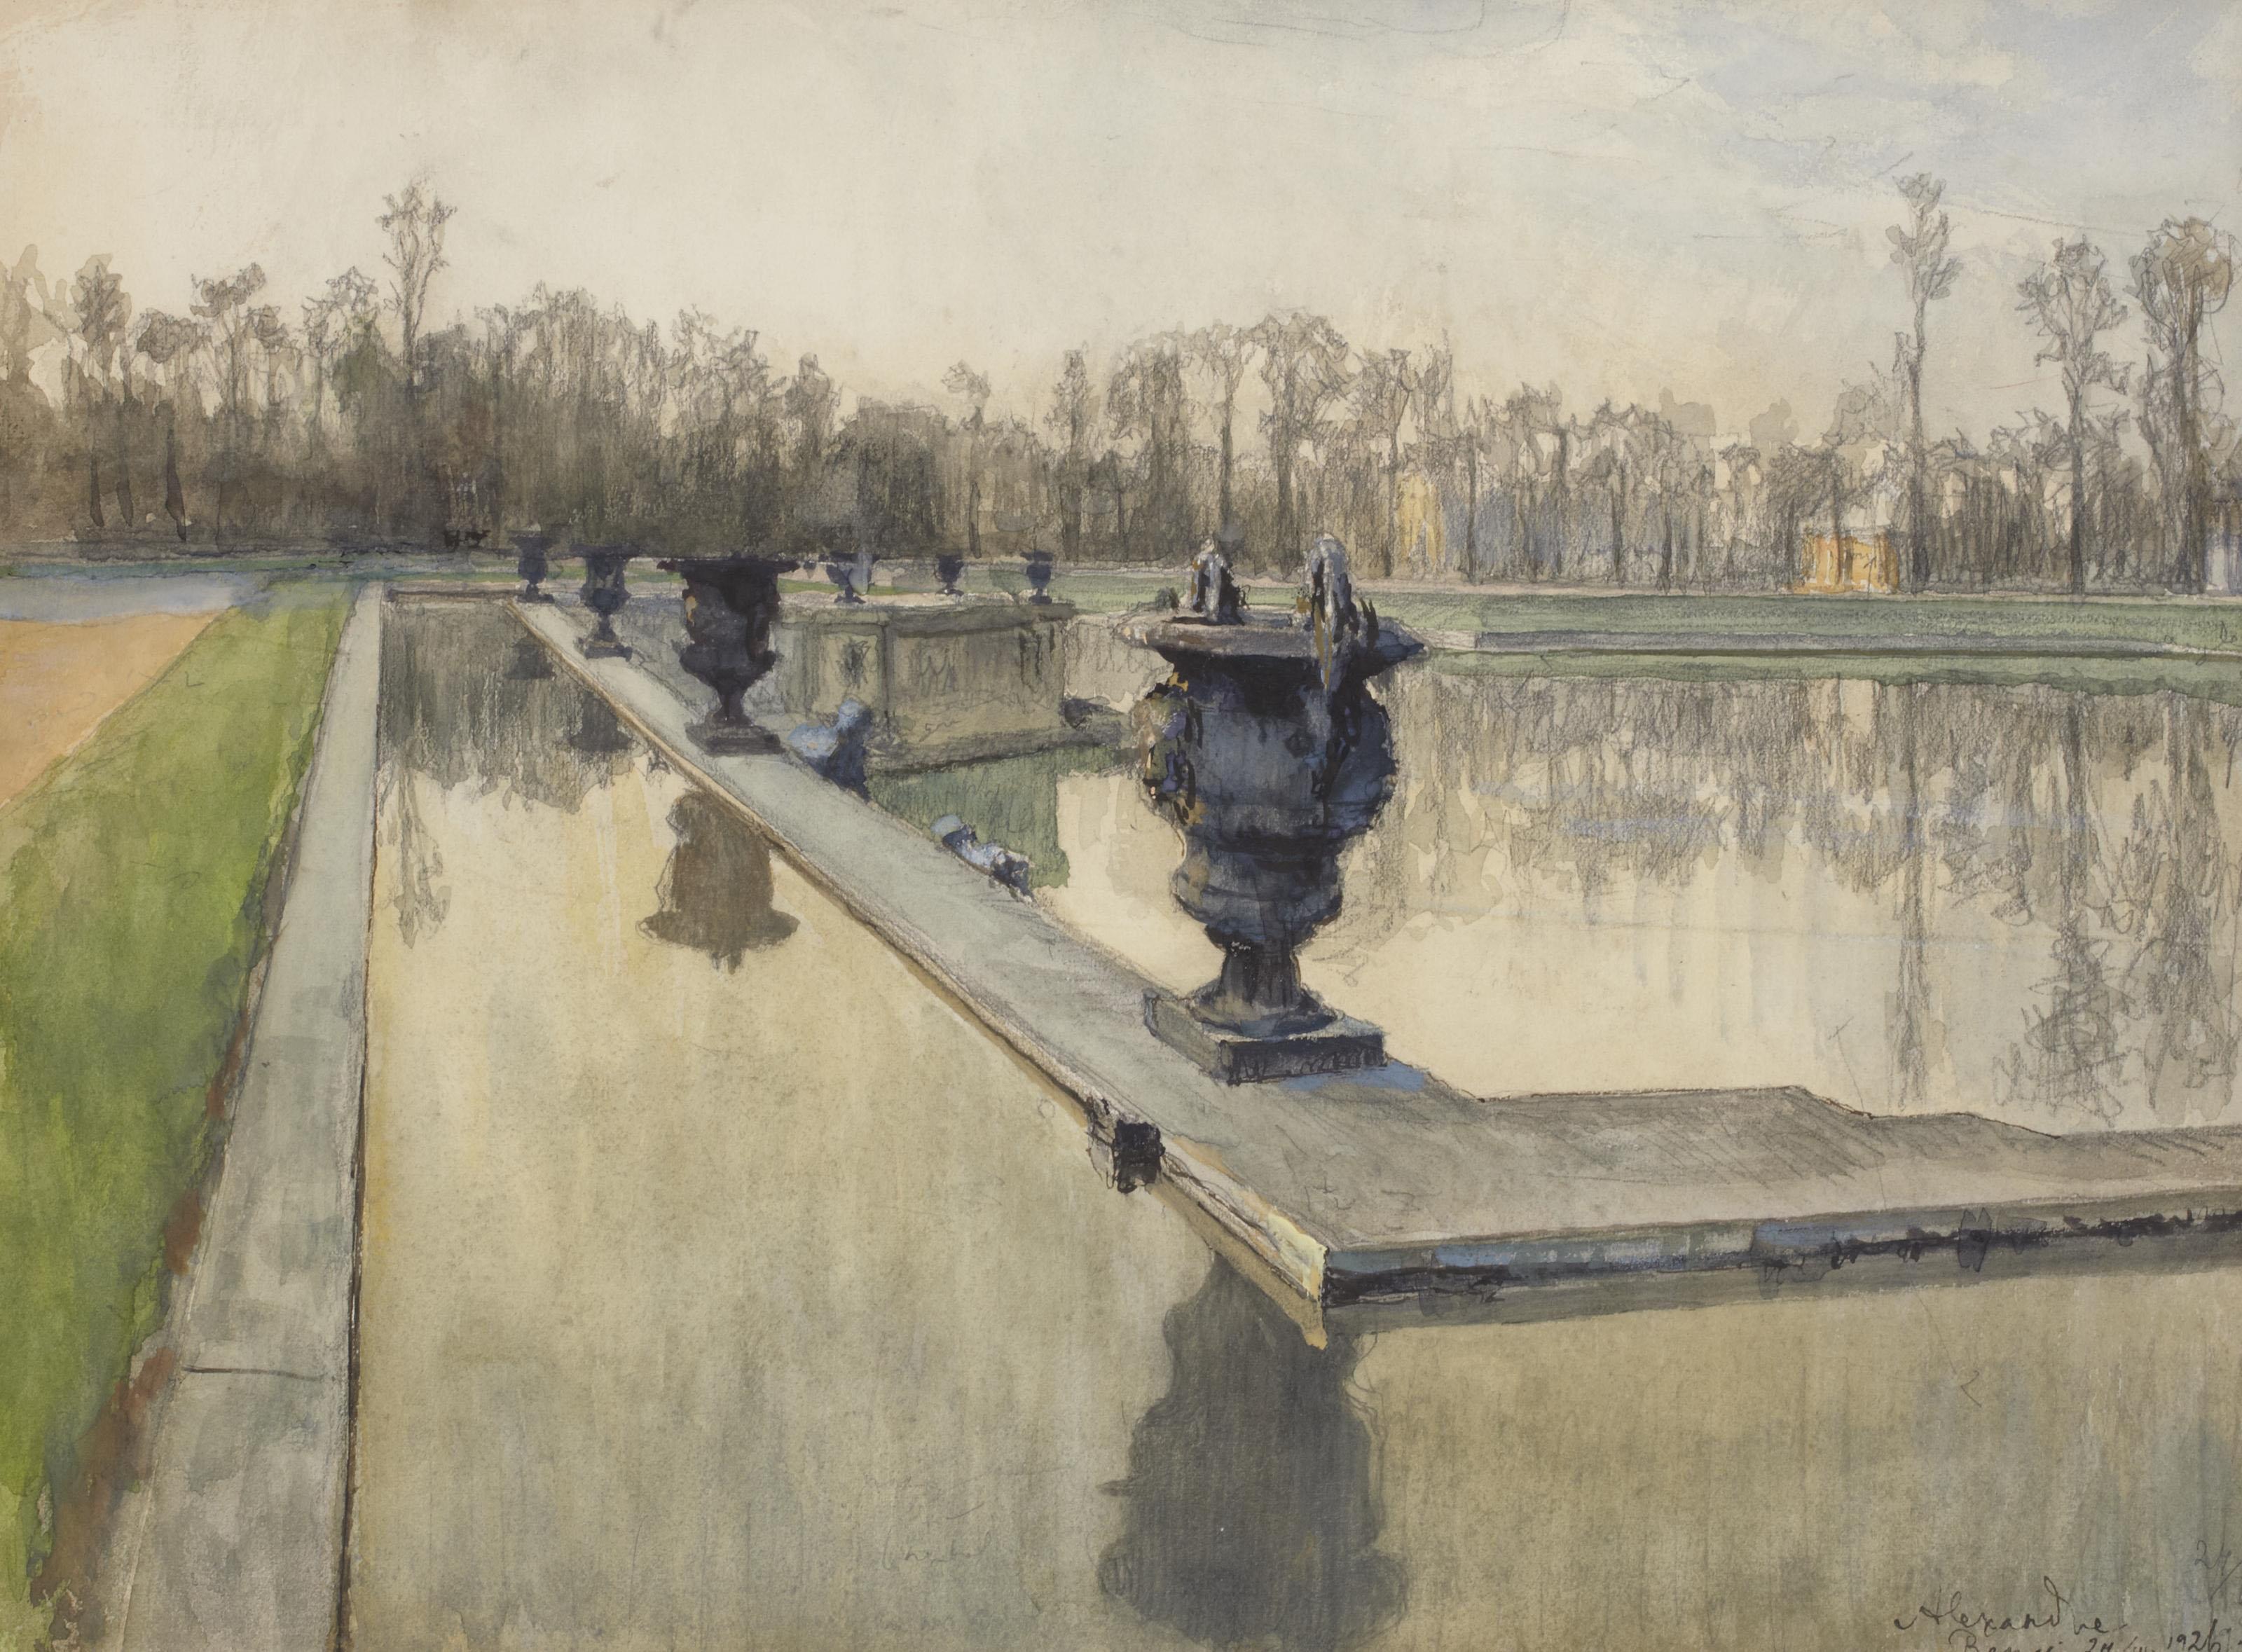 Alexandre Benois (1870-1960)